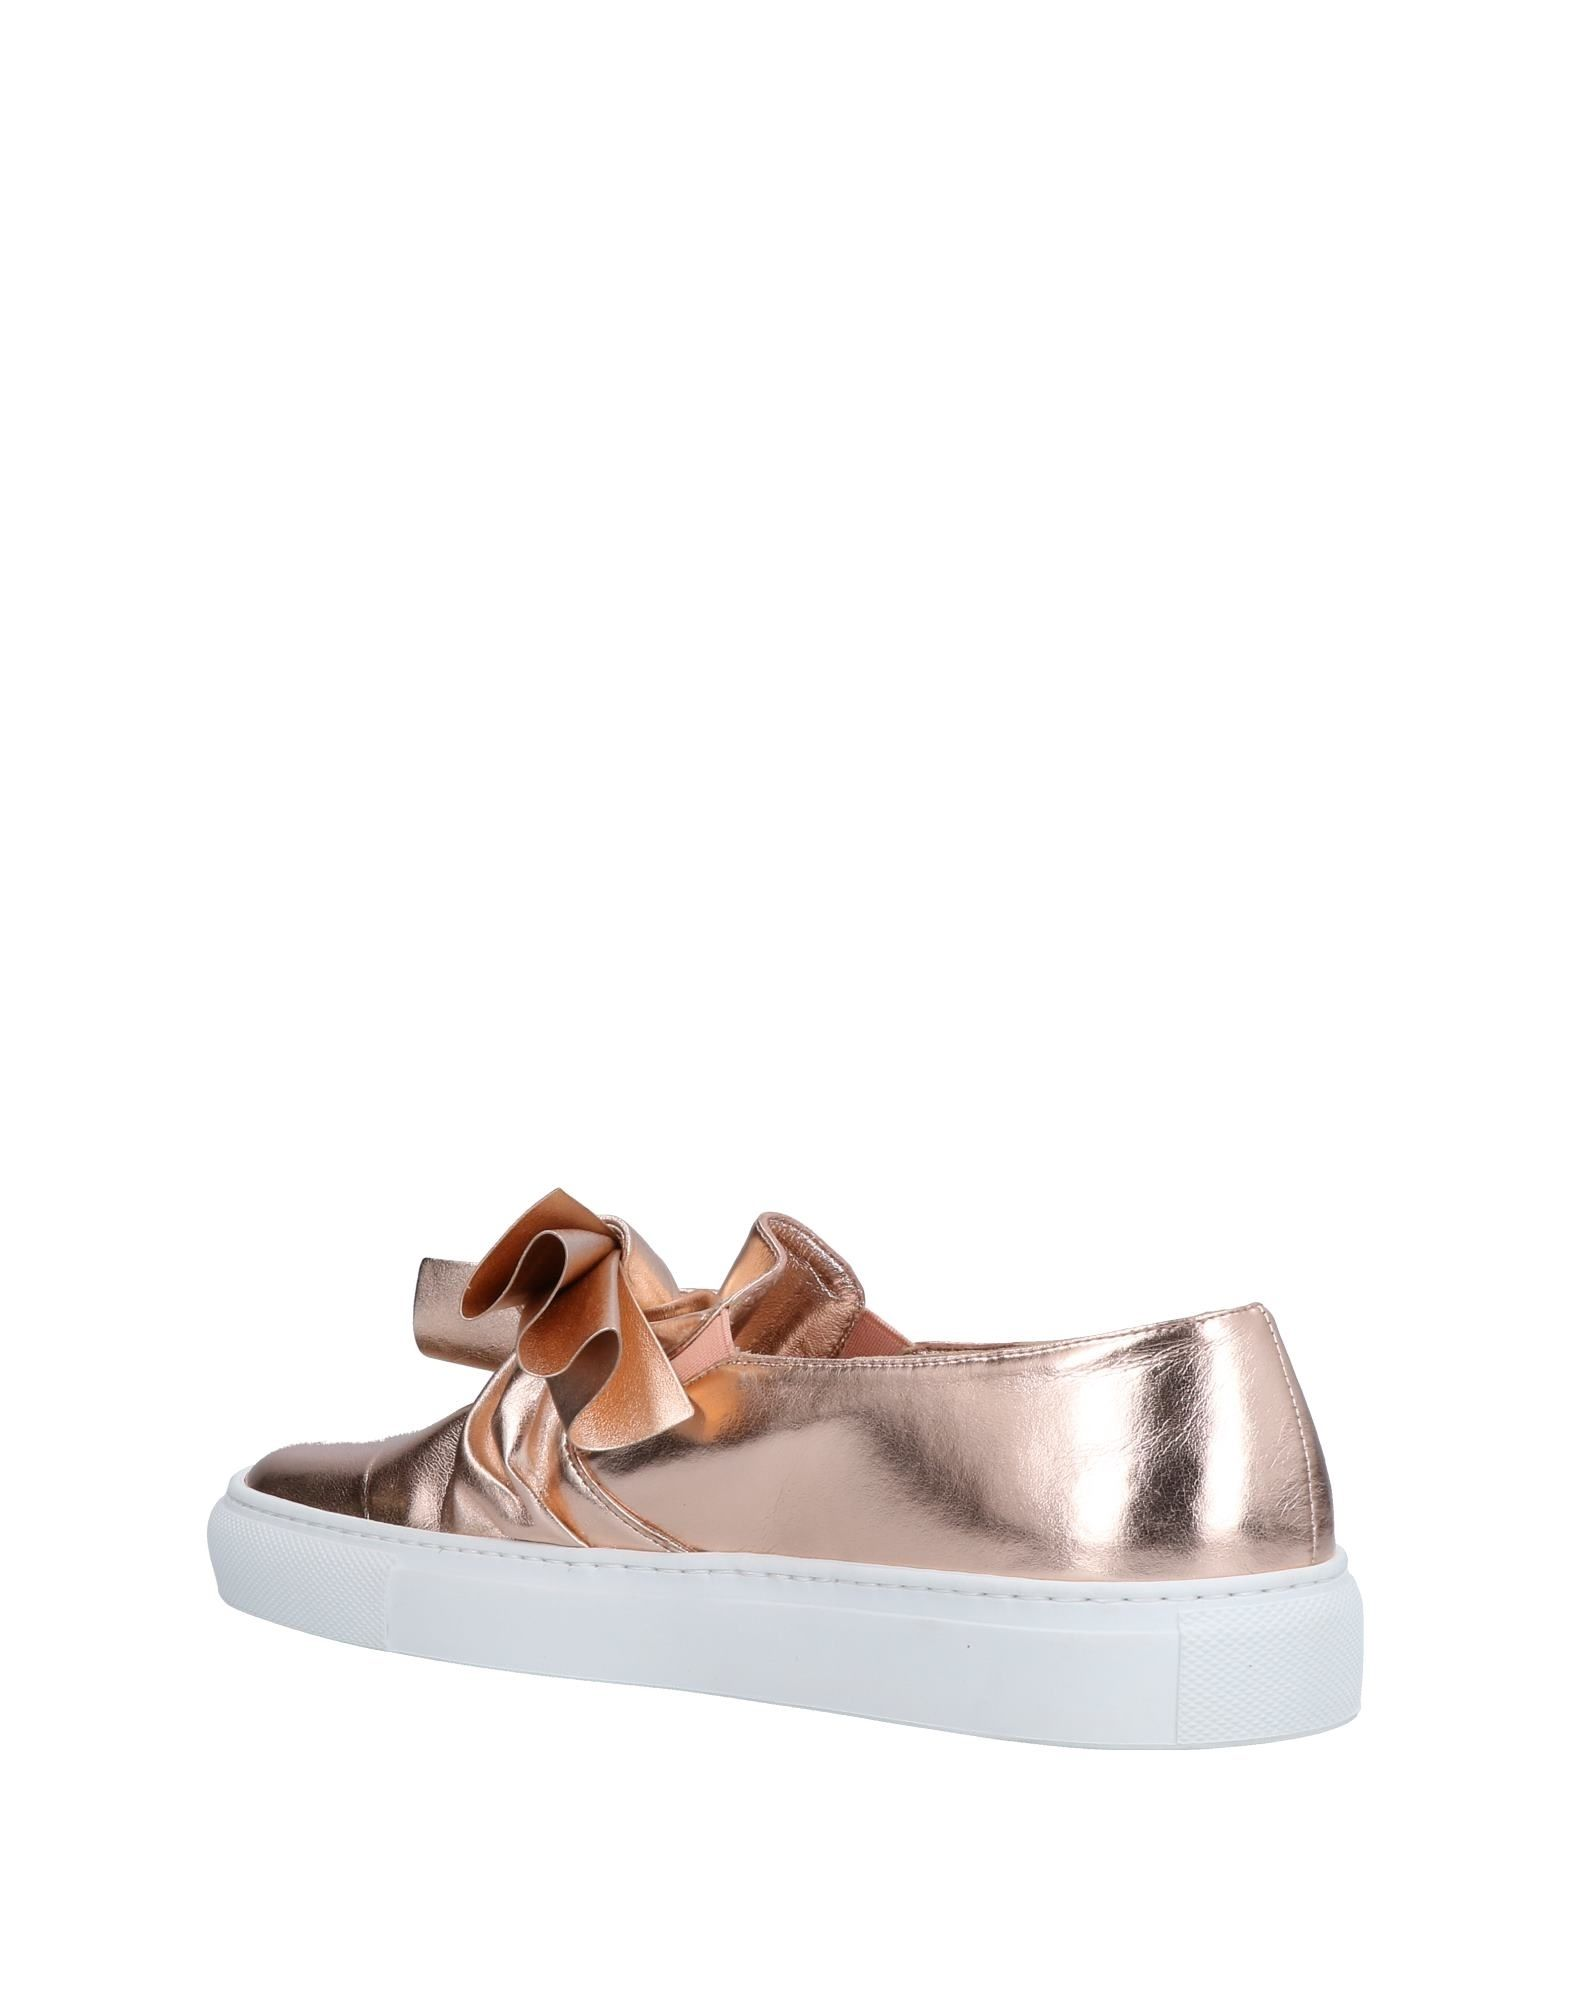 Cedric Charlier  Sneakers Damen  Charlier 11518923HH Neue Schuhe 39acd4